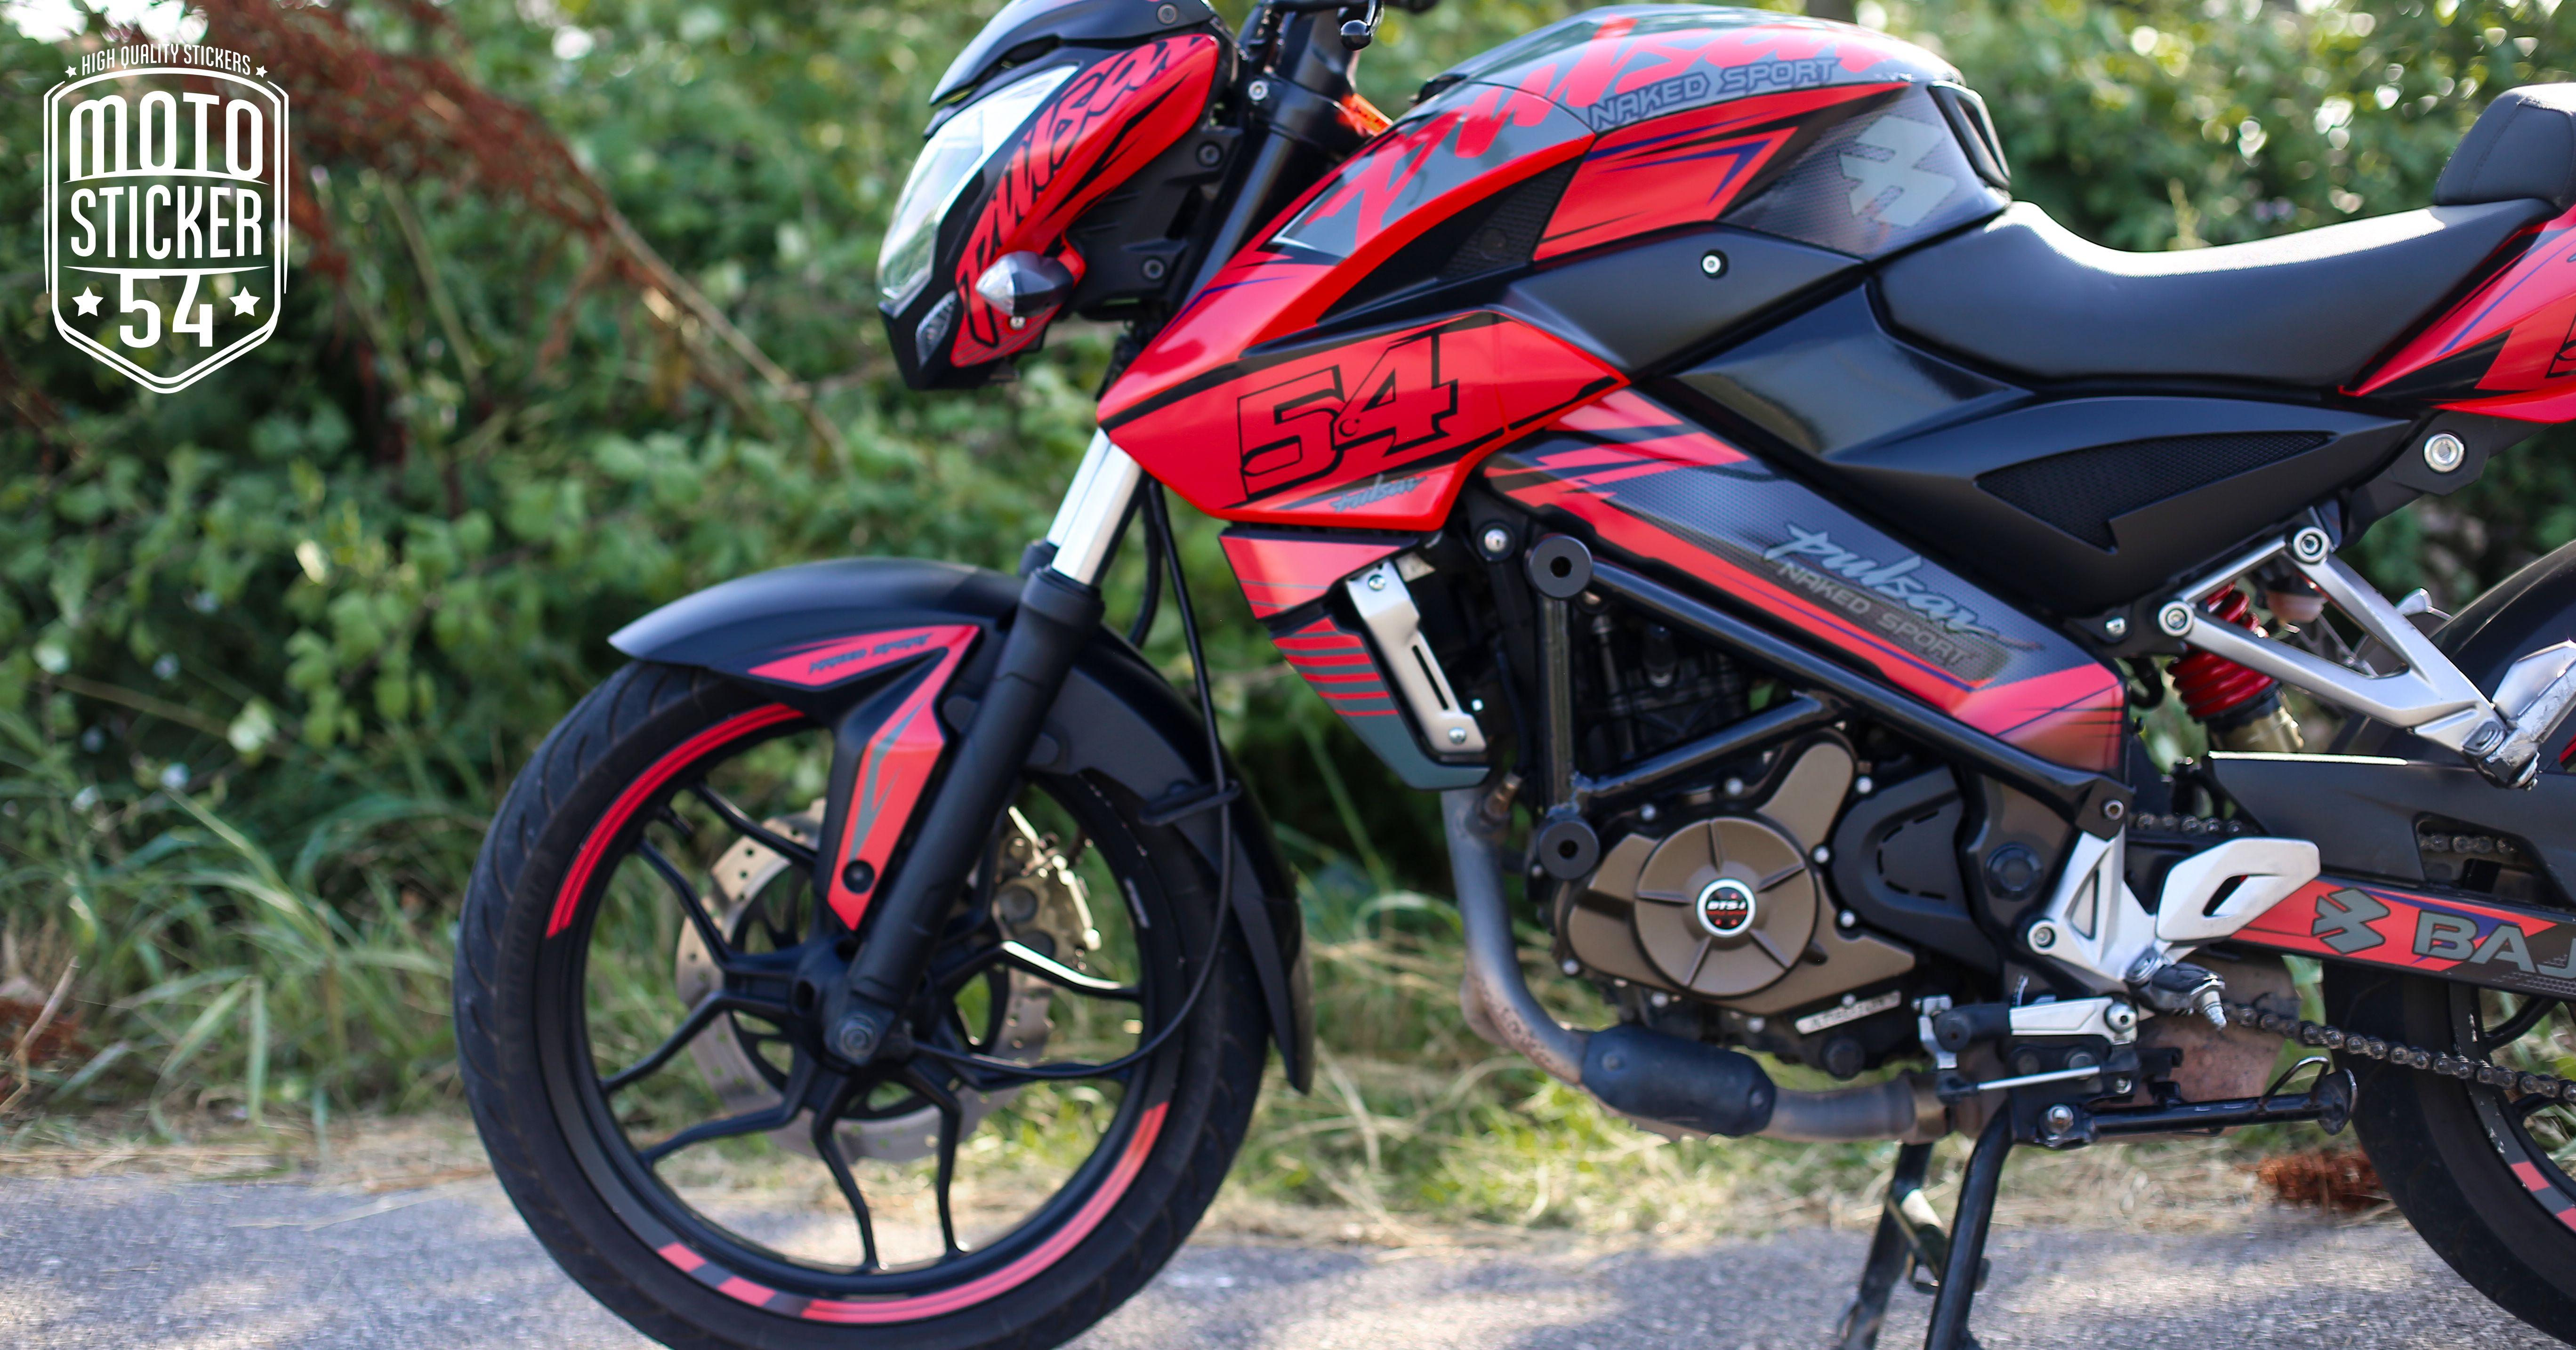 Bajaj pulsar ns200 custom design red sticker kit